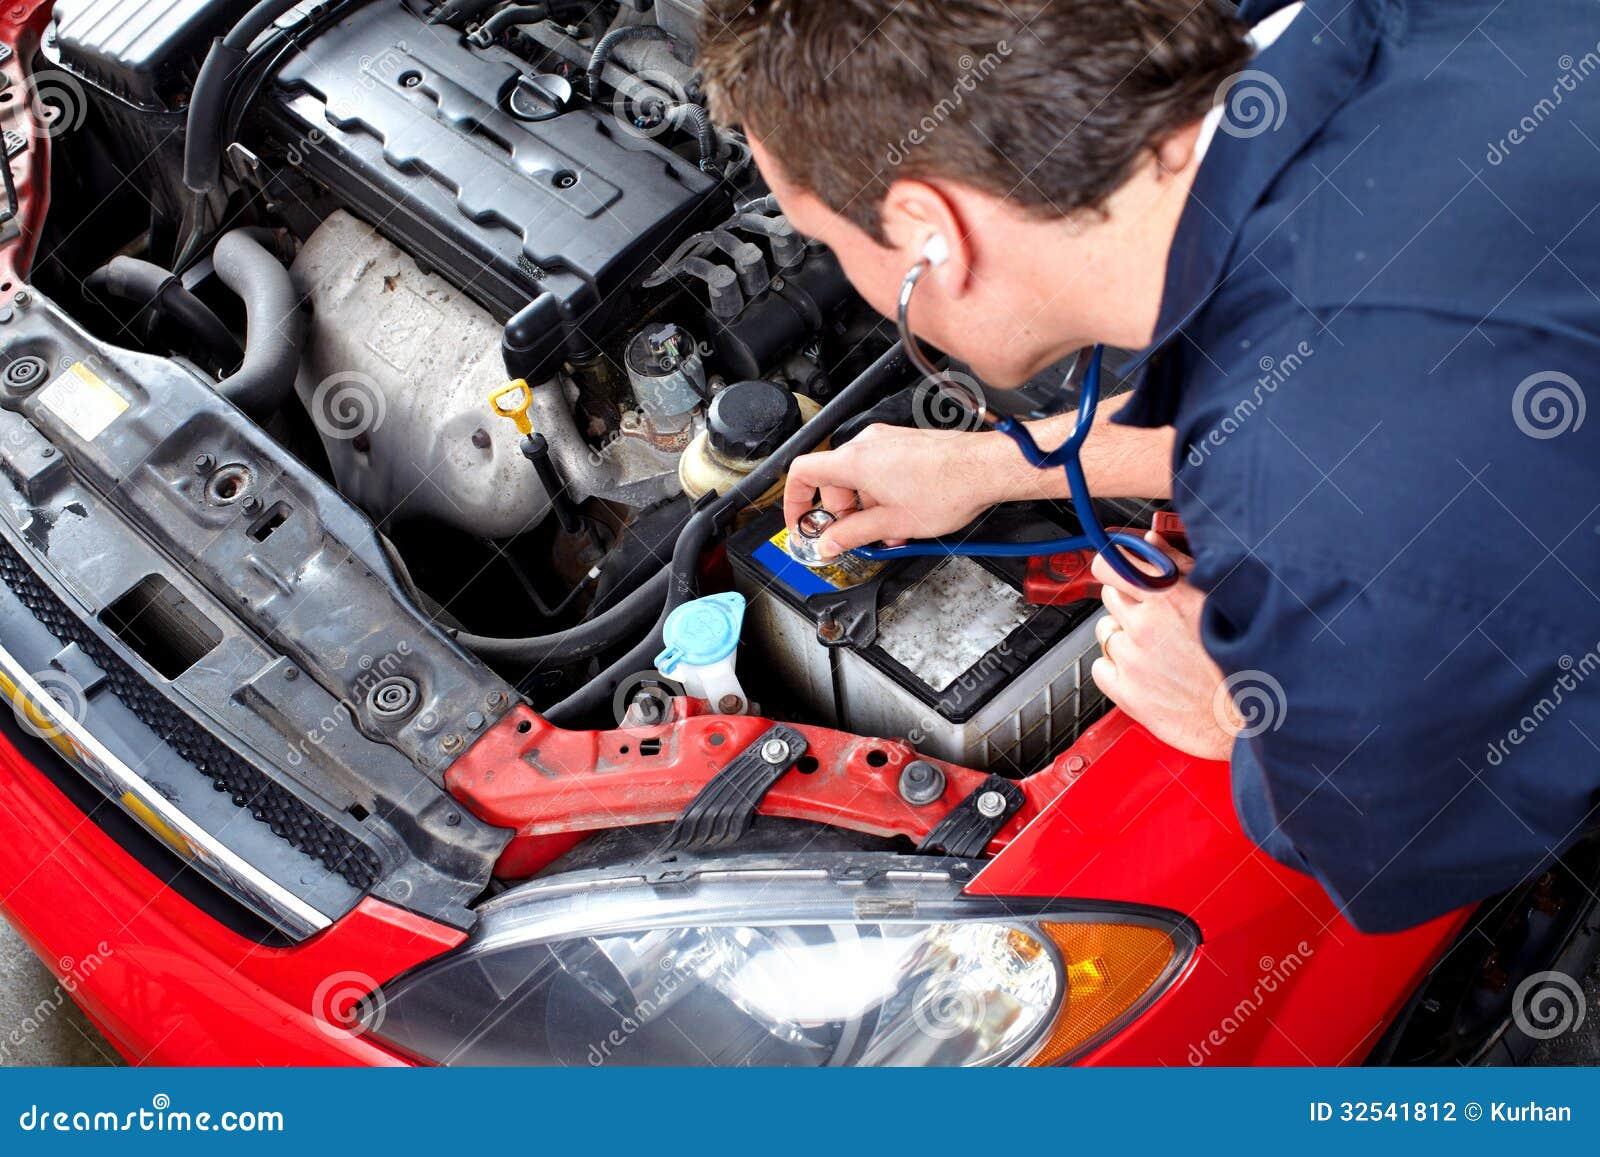 Job Service Nd Repair Car